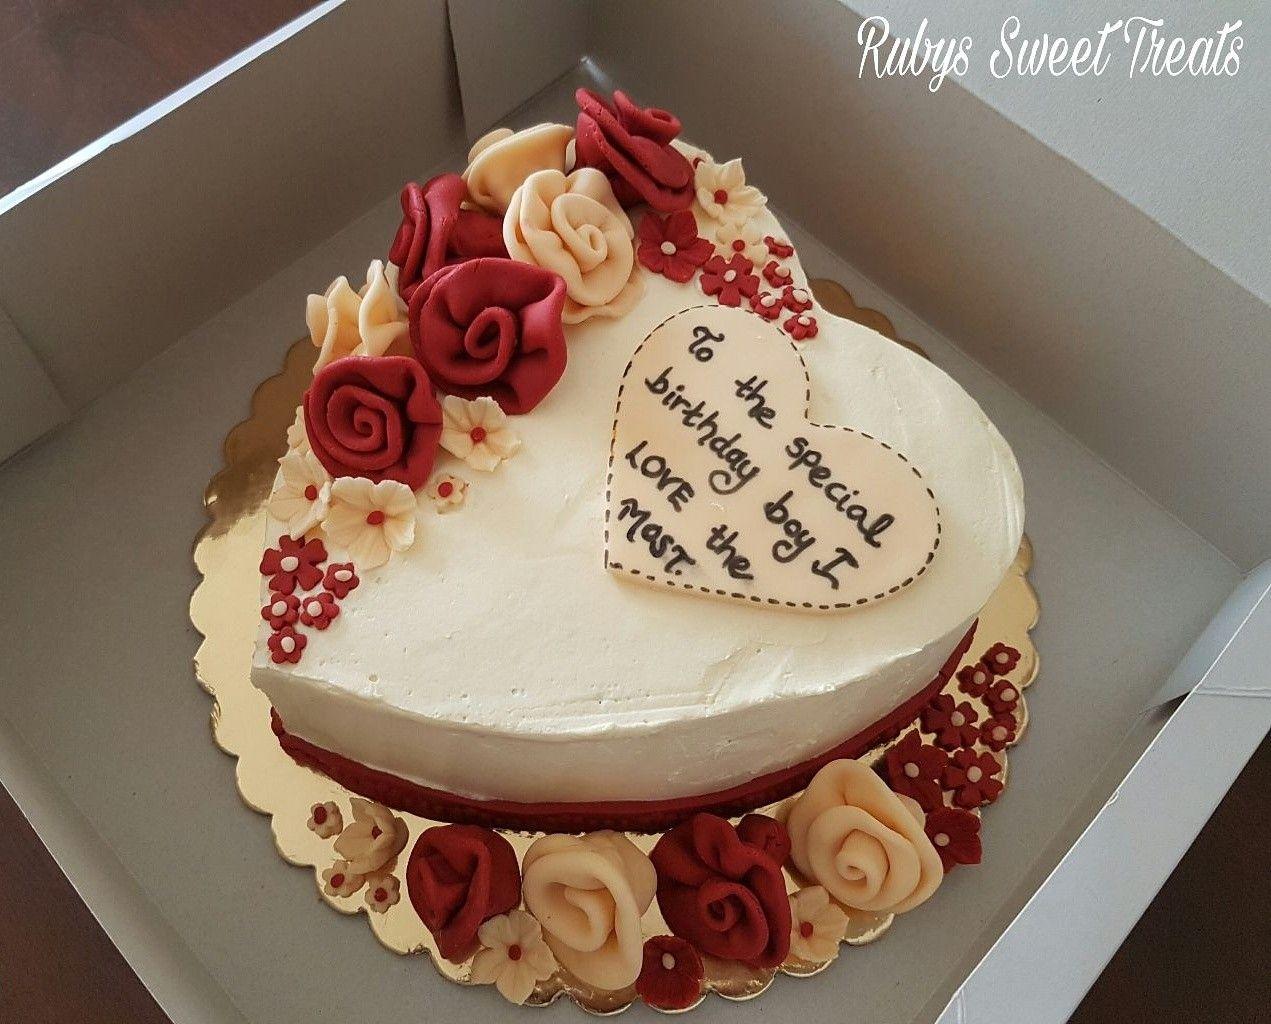 Pin by rubina khatri on rubys sweet treats instagram